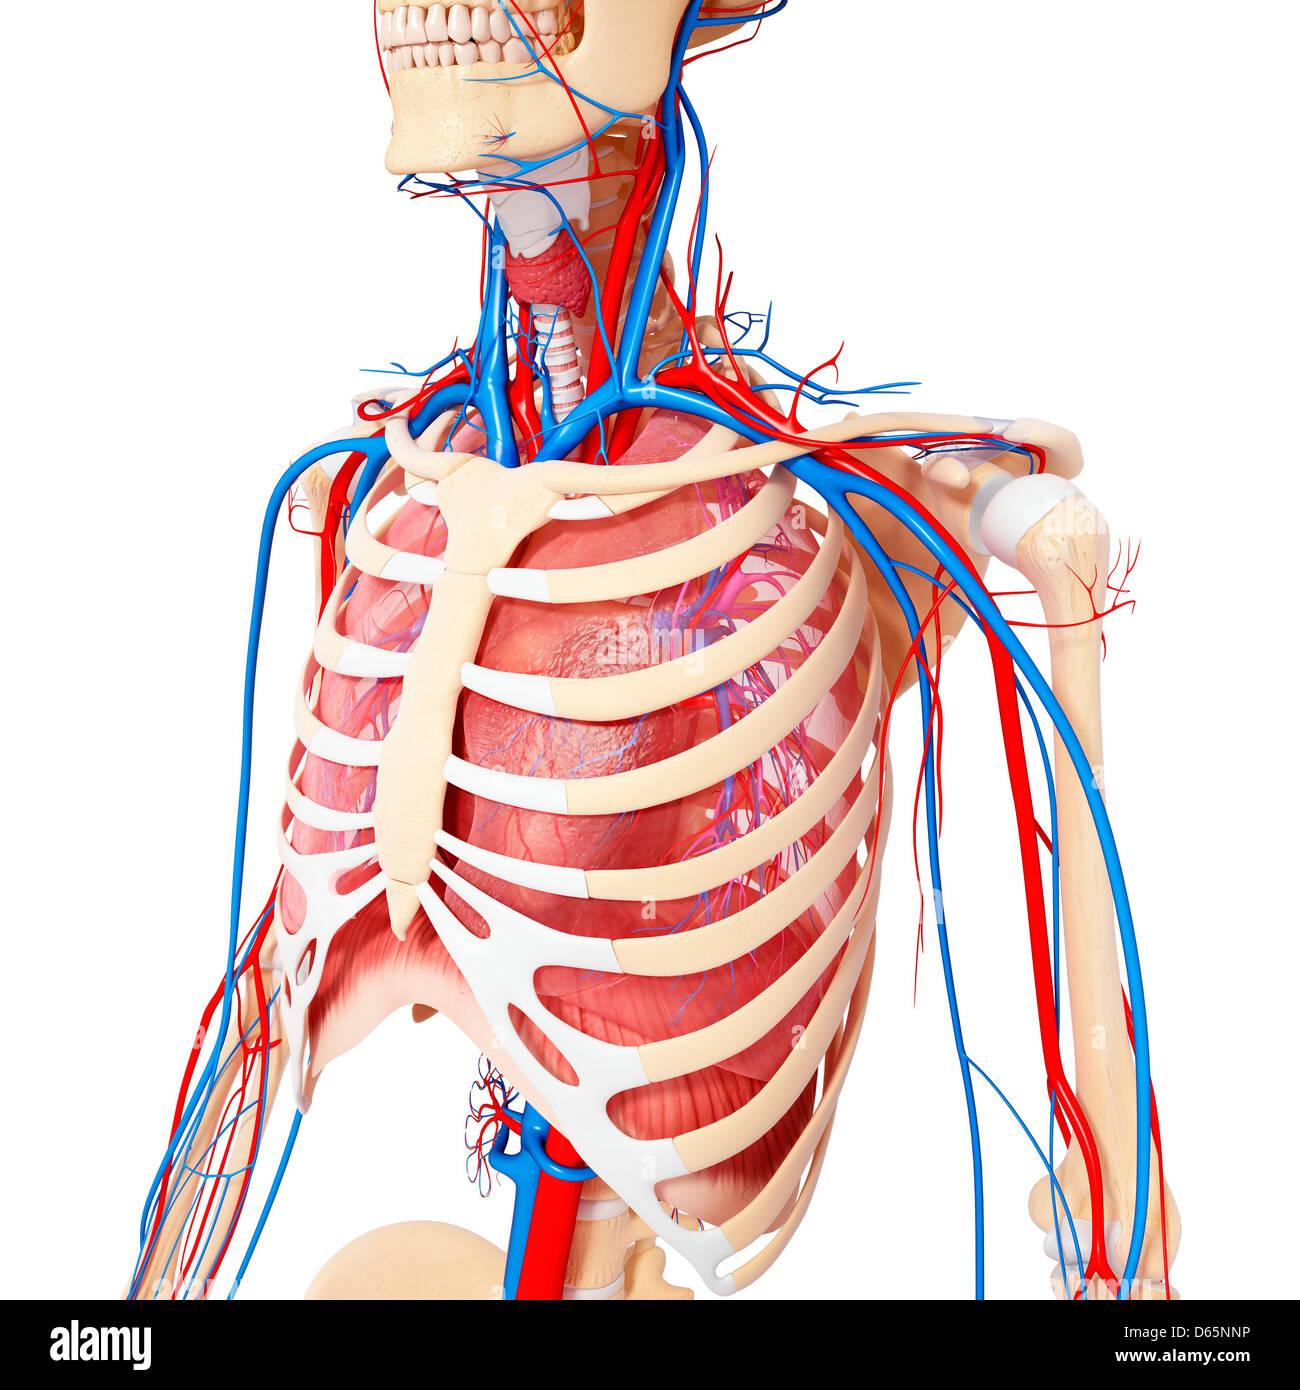 Chest Organ Diagram Wiring Diagrams